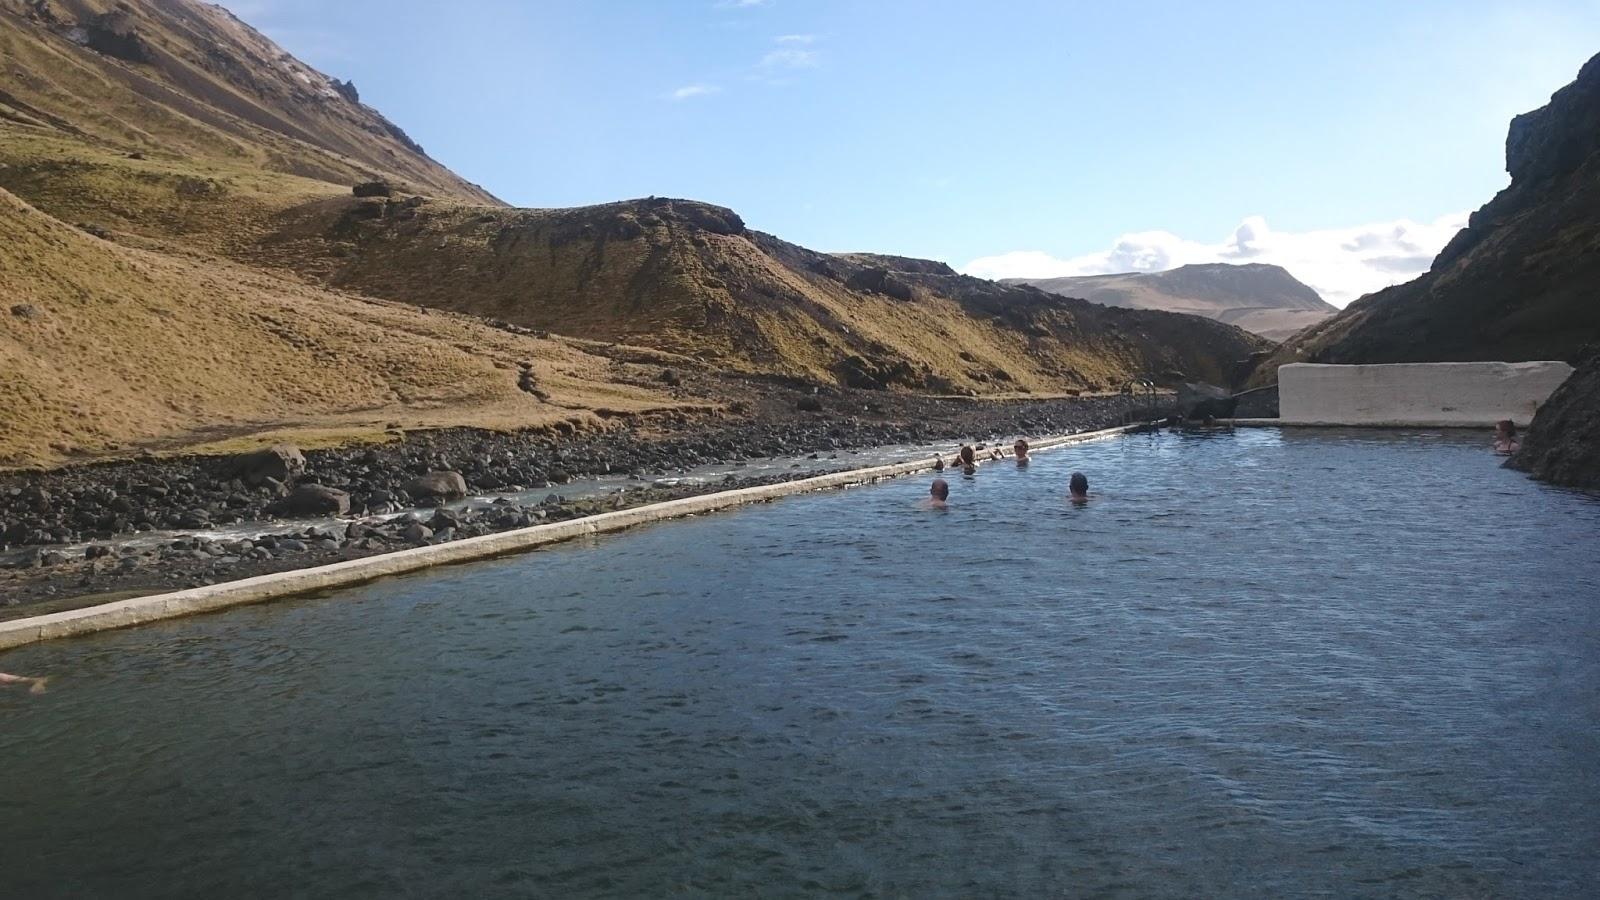 basen Seljavallalaug, basen, dziki basen, islandzki basen, gorące źródła Islandia